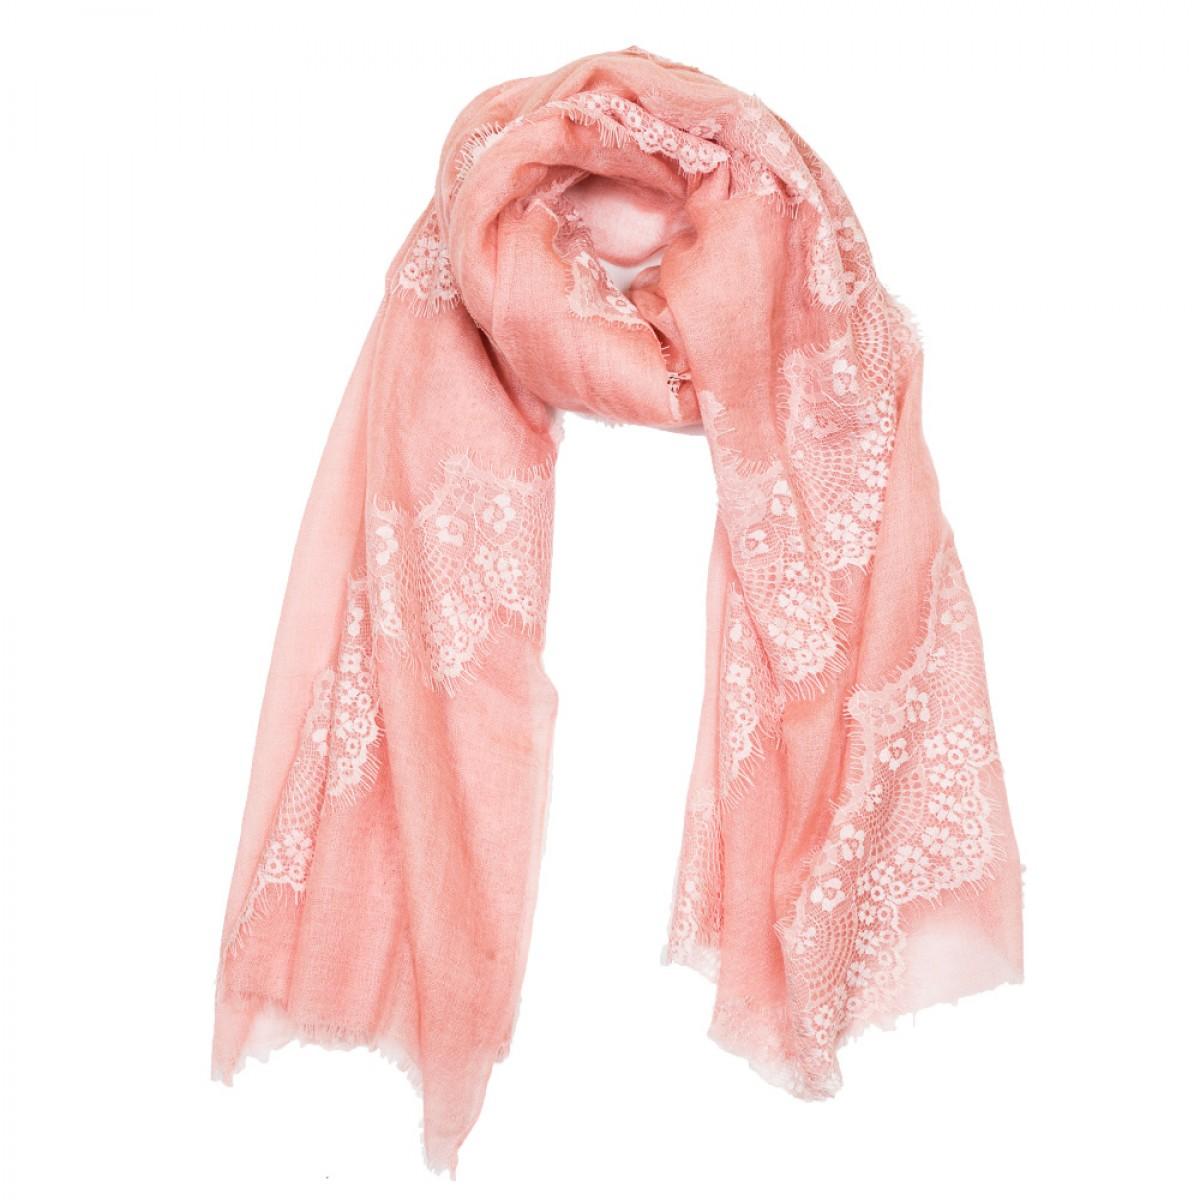 Lace Sheer Cashmere Pashmina Scarf - Apricot Blush